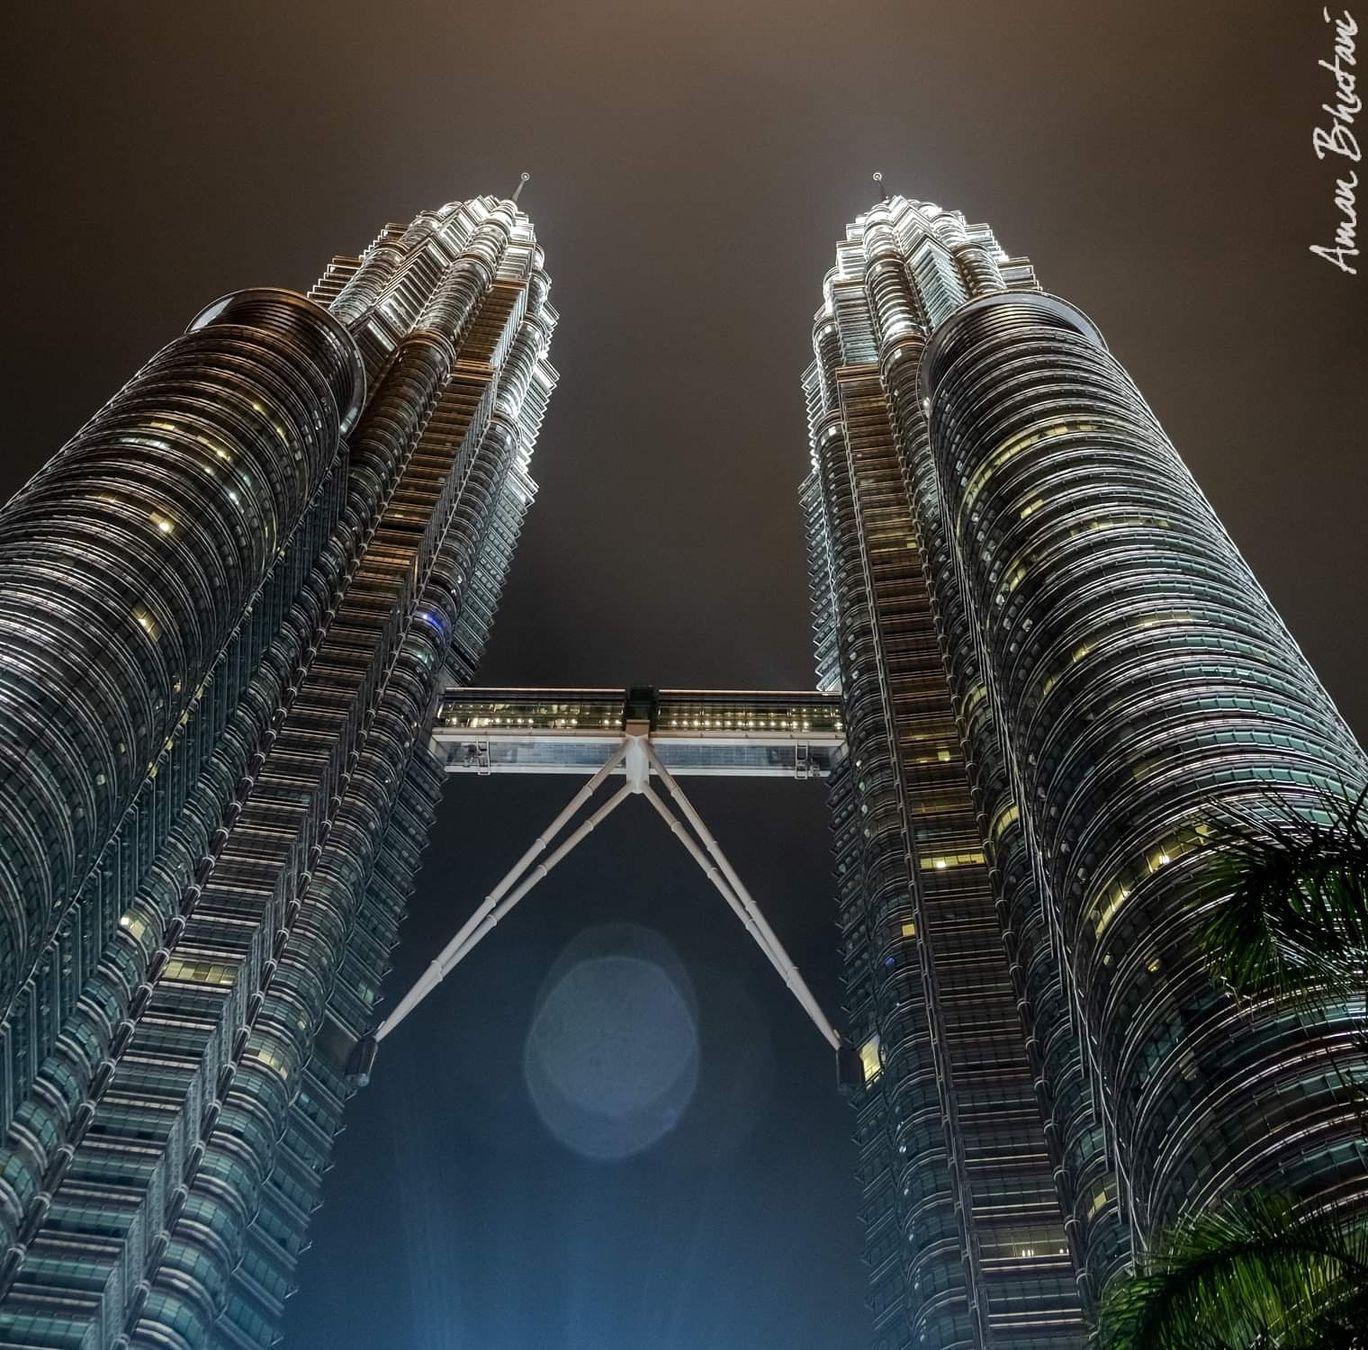 Photo of Petronas Twin Towers By Aman Bhutani